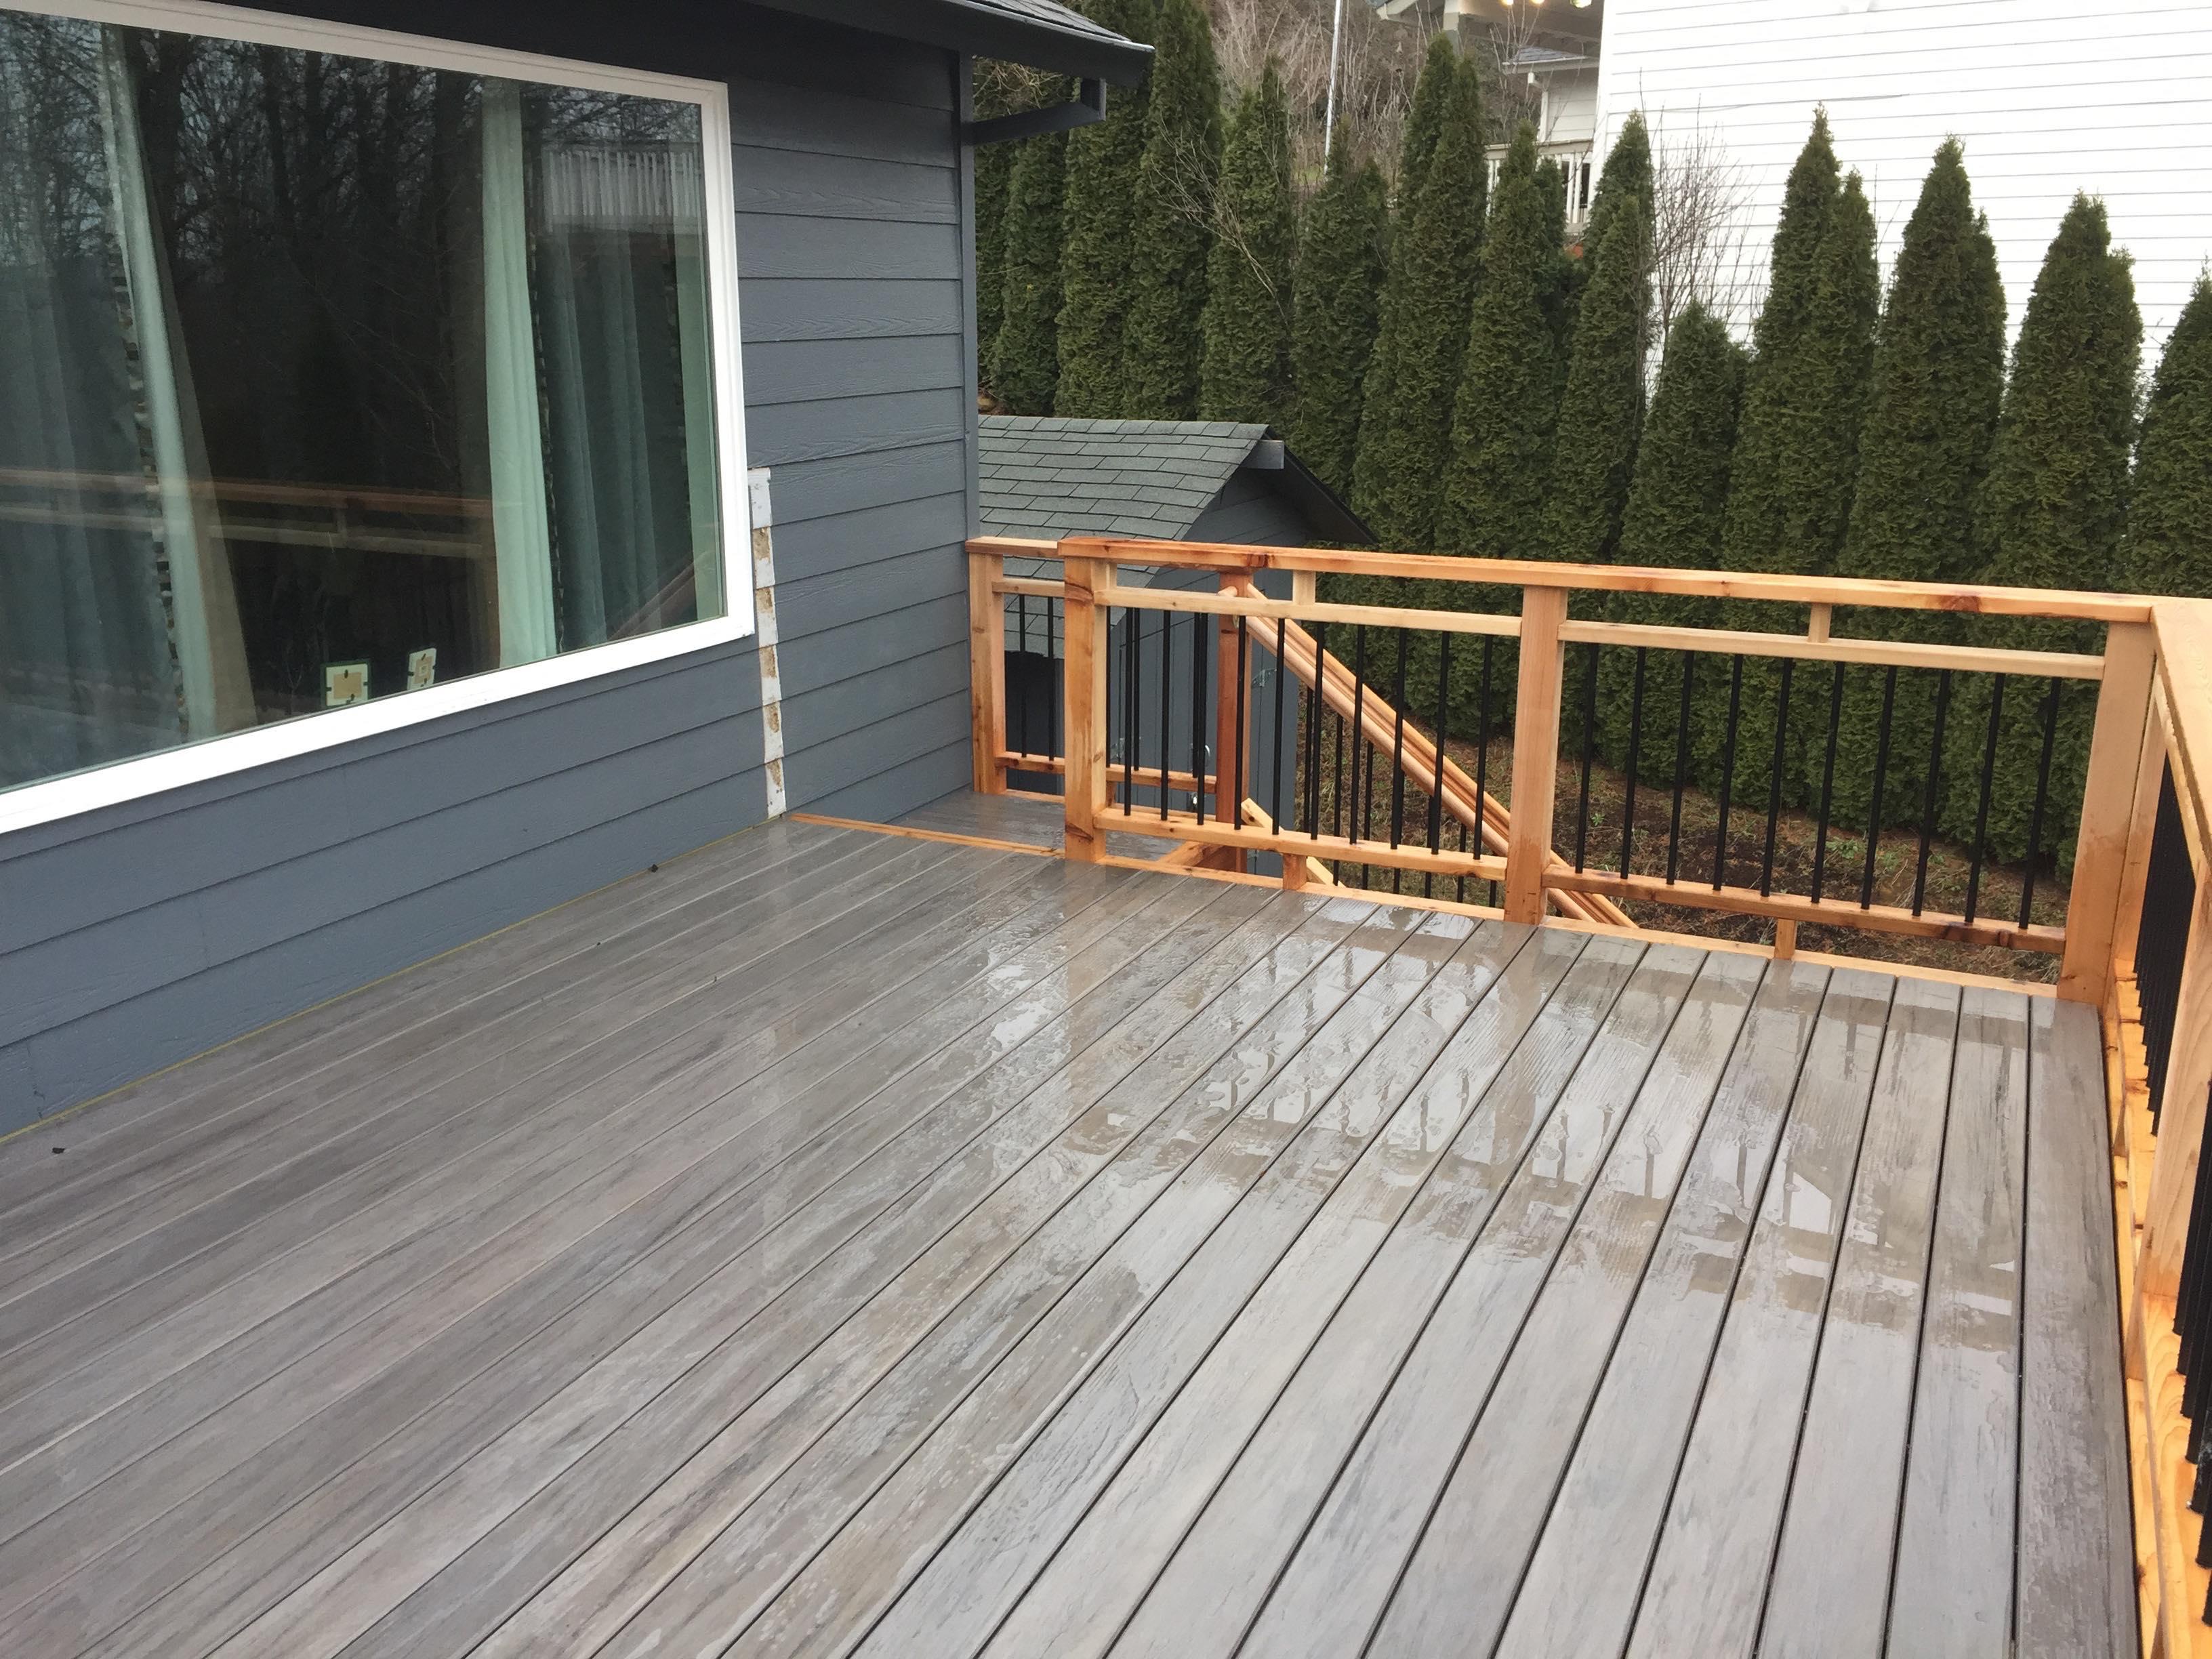 Timbertech Deck w/cedar rails and Dekorator pickets